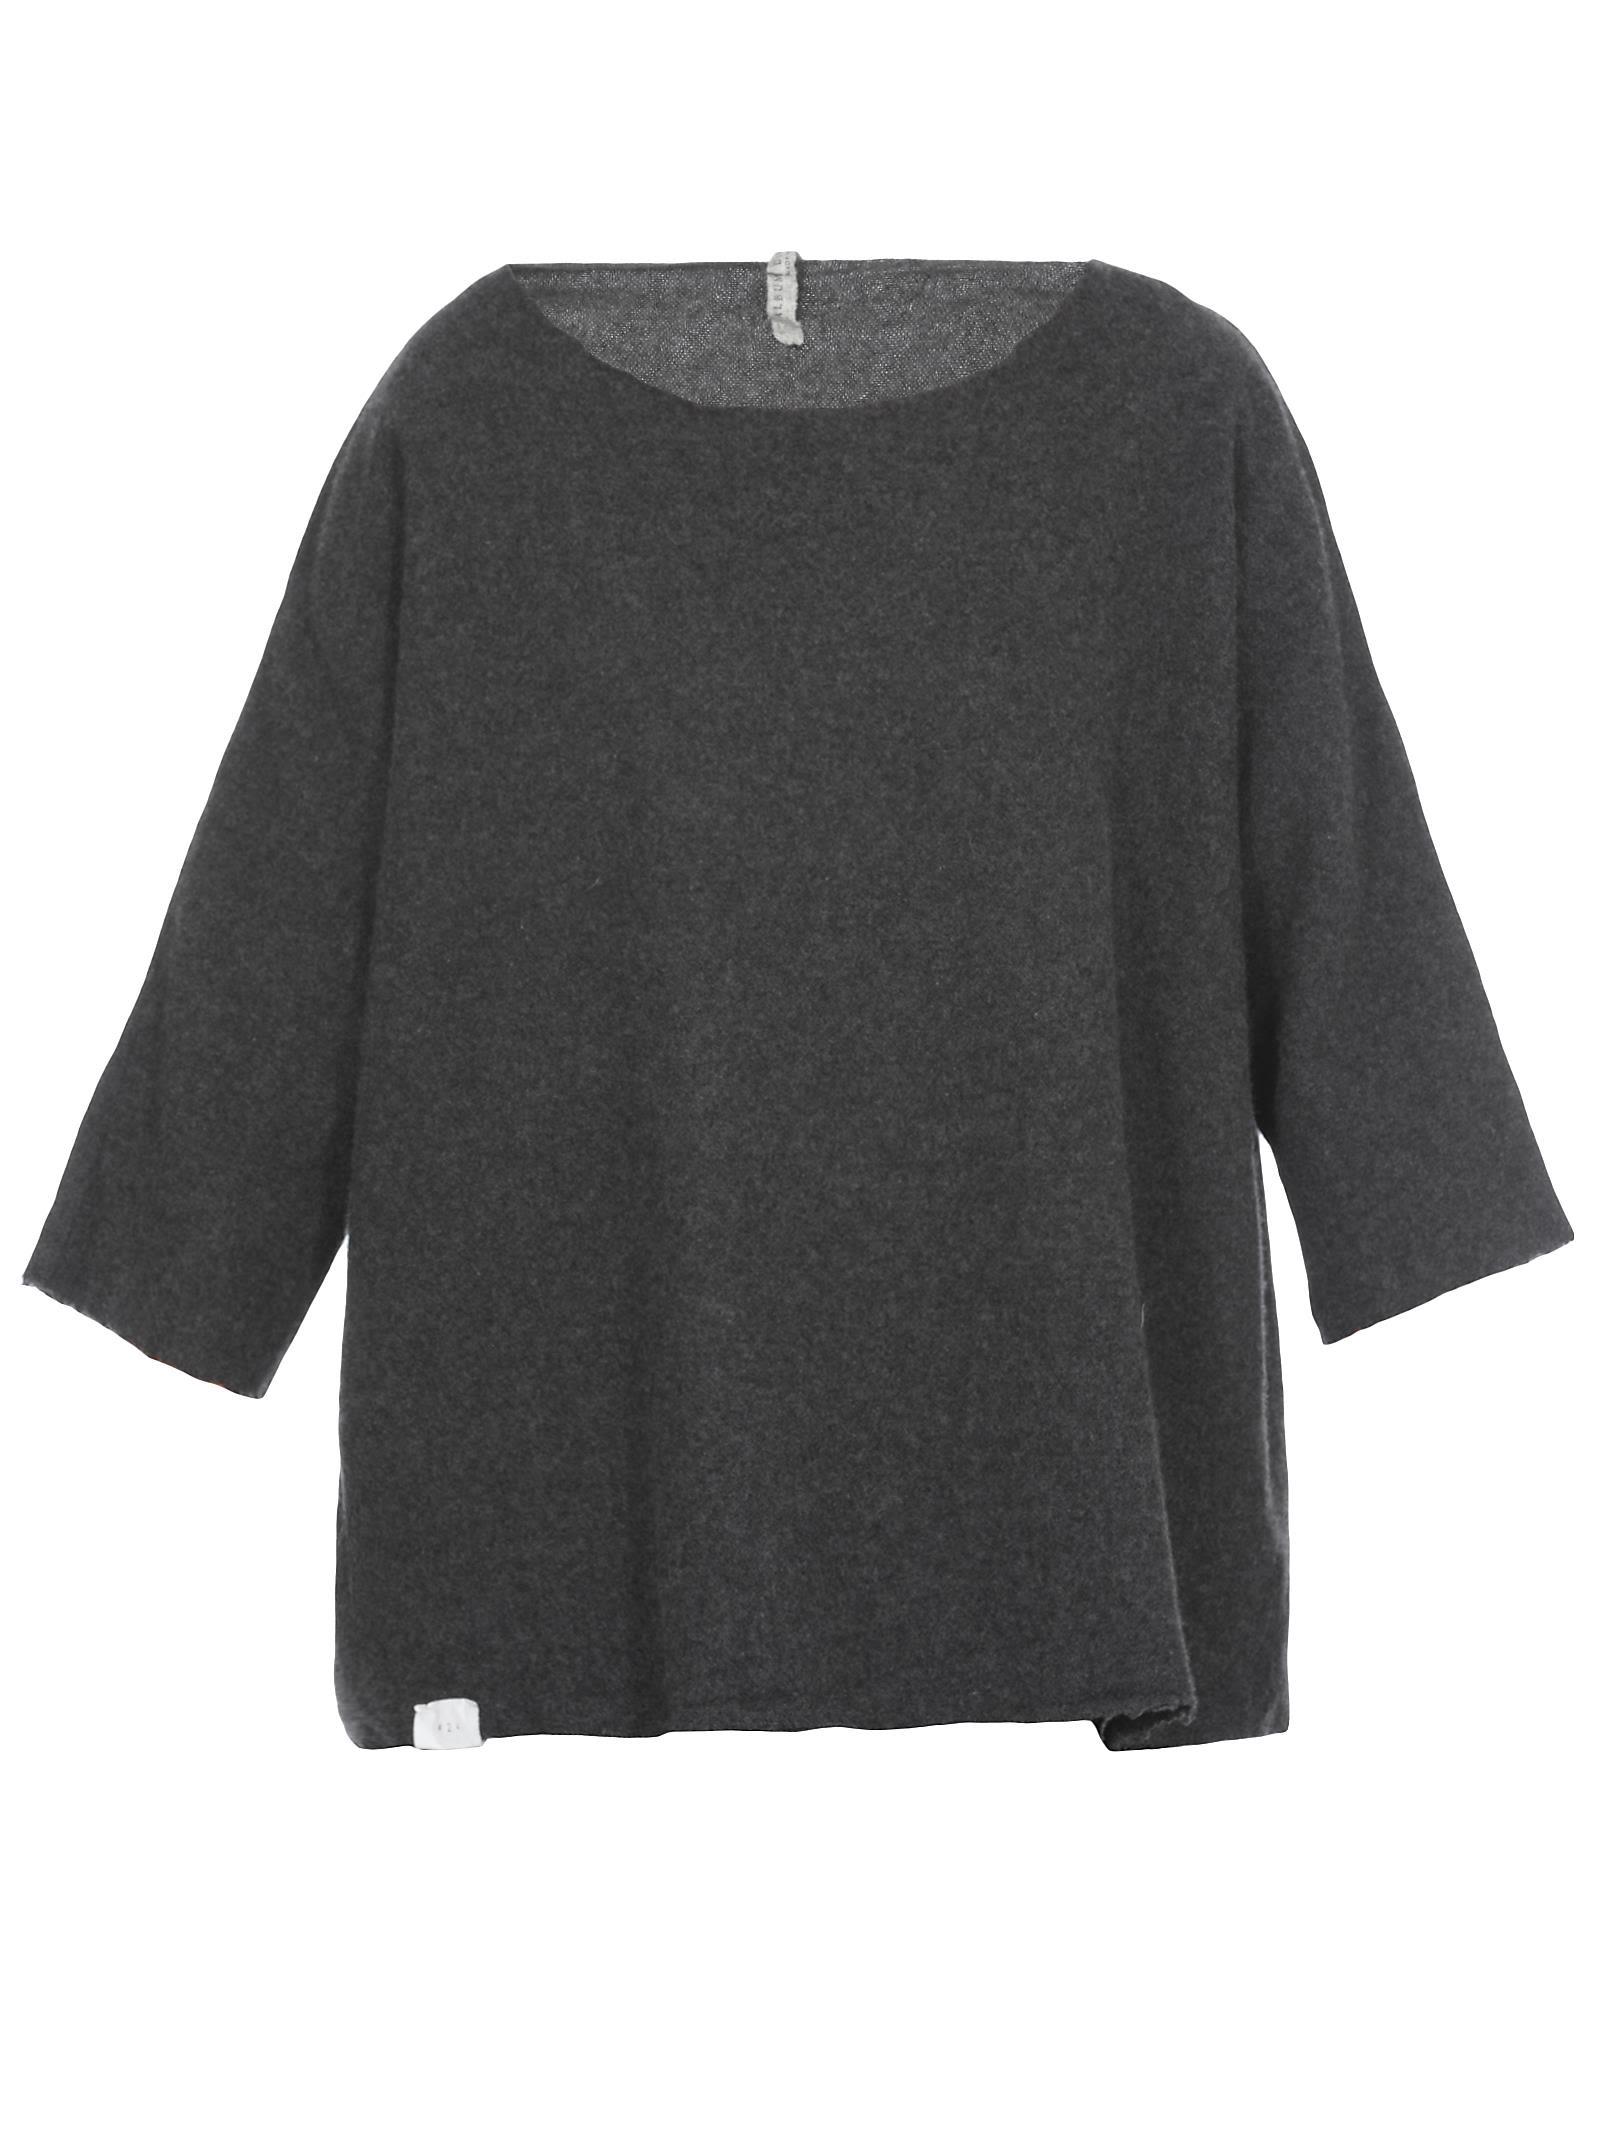 ALBUM DI FAMIGLIA Wool And Cashmere Sweater in Grey